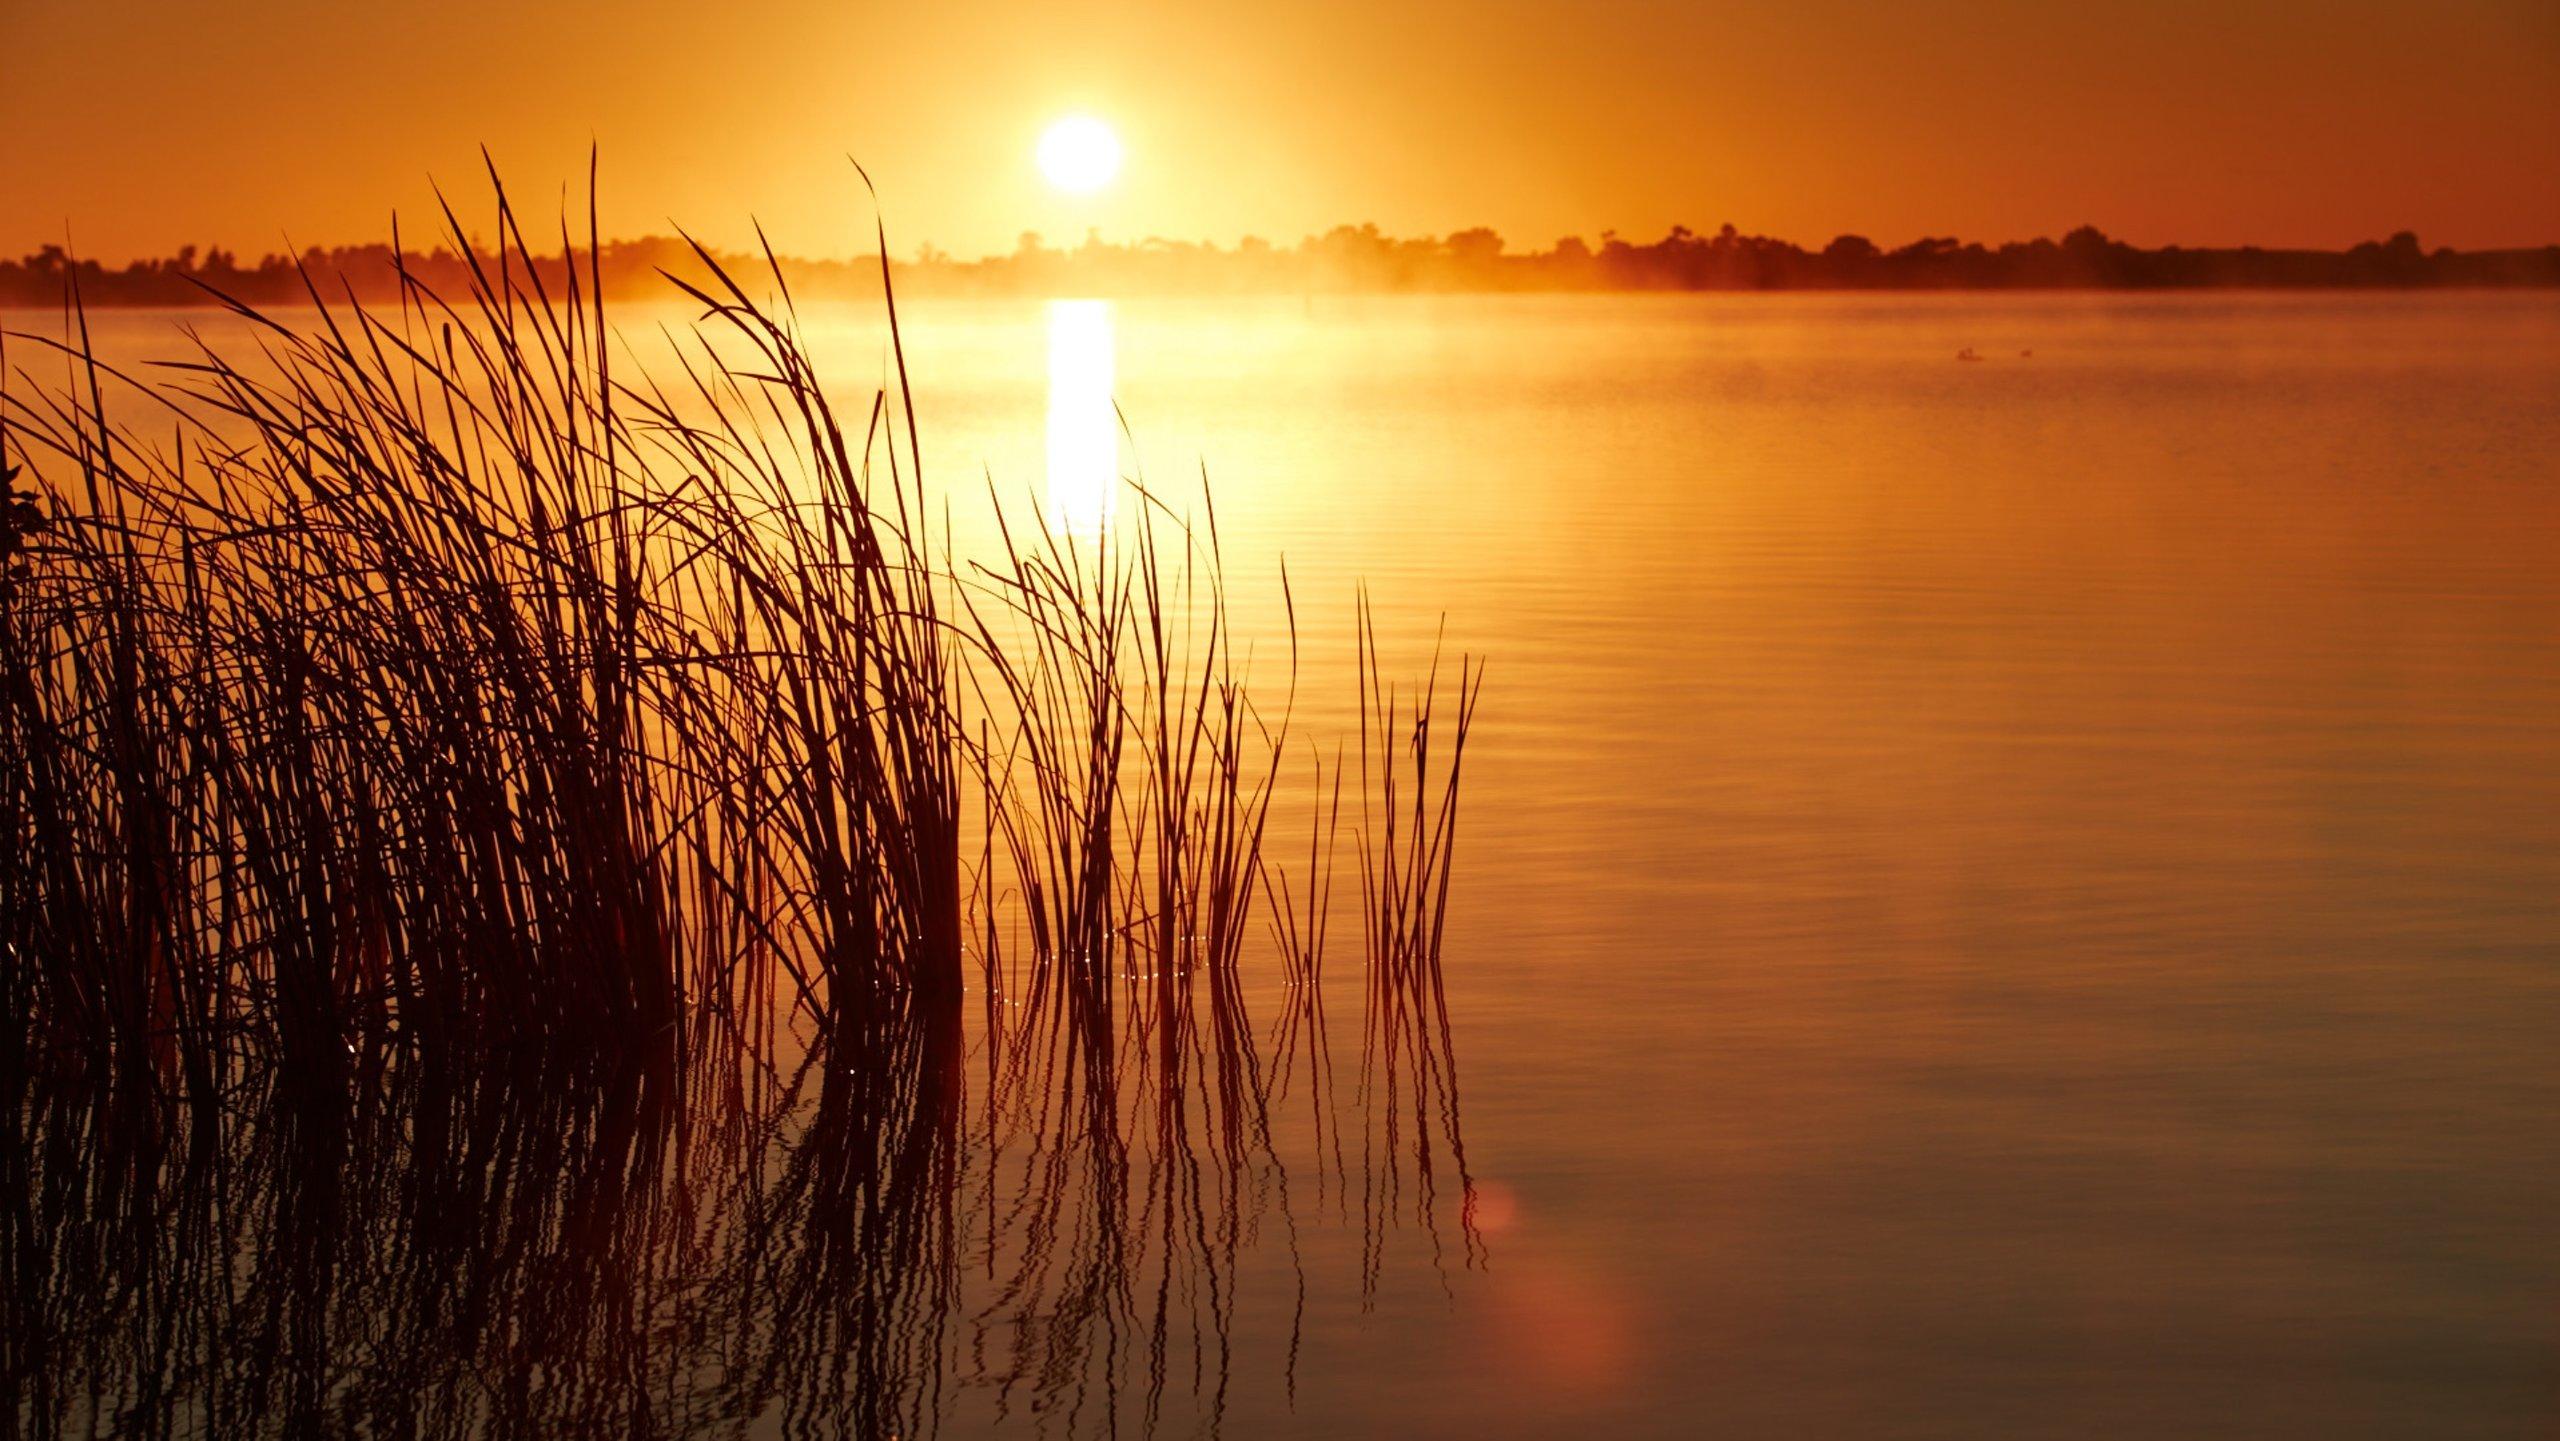 Swan Hill Rural City, Victoria, Australia